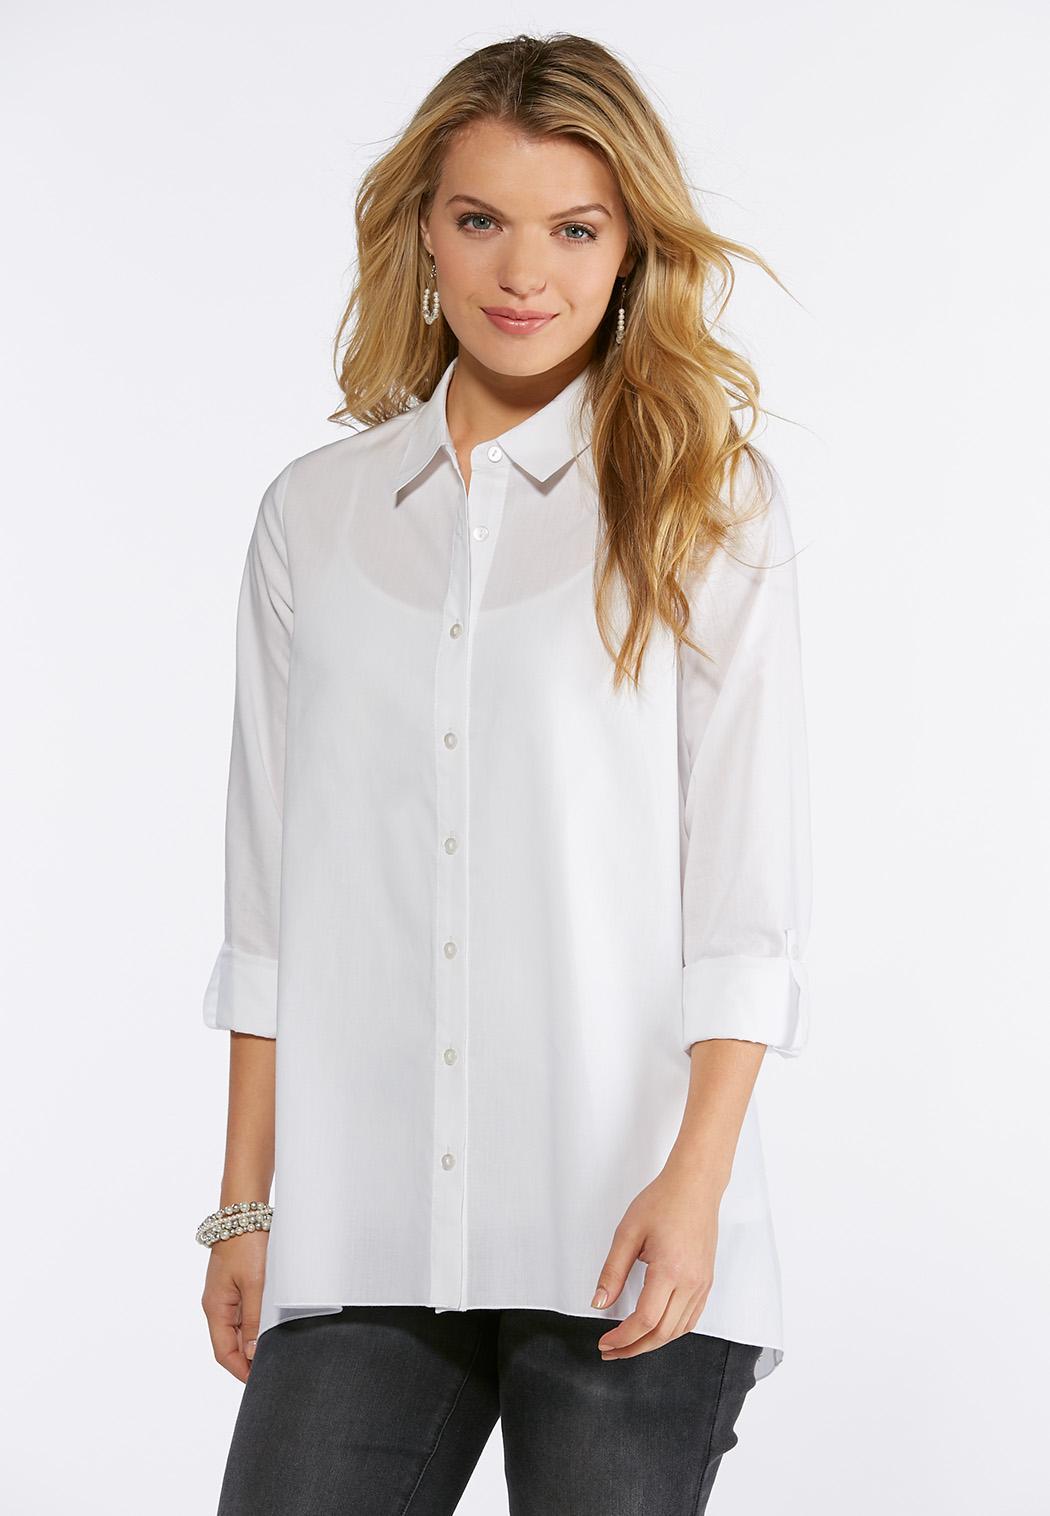 5e8efe0e5890 White Button Down Tunic Top Shirts   Blouses Cato Fashions